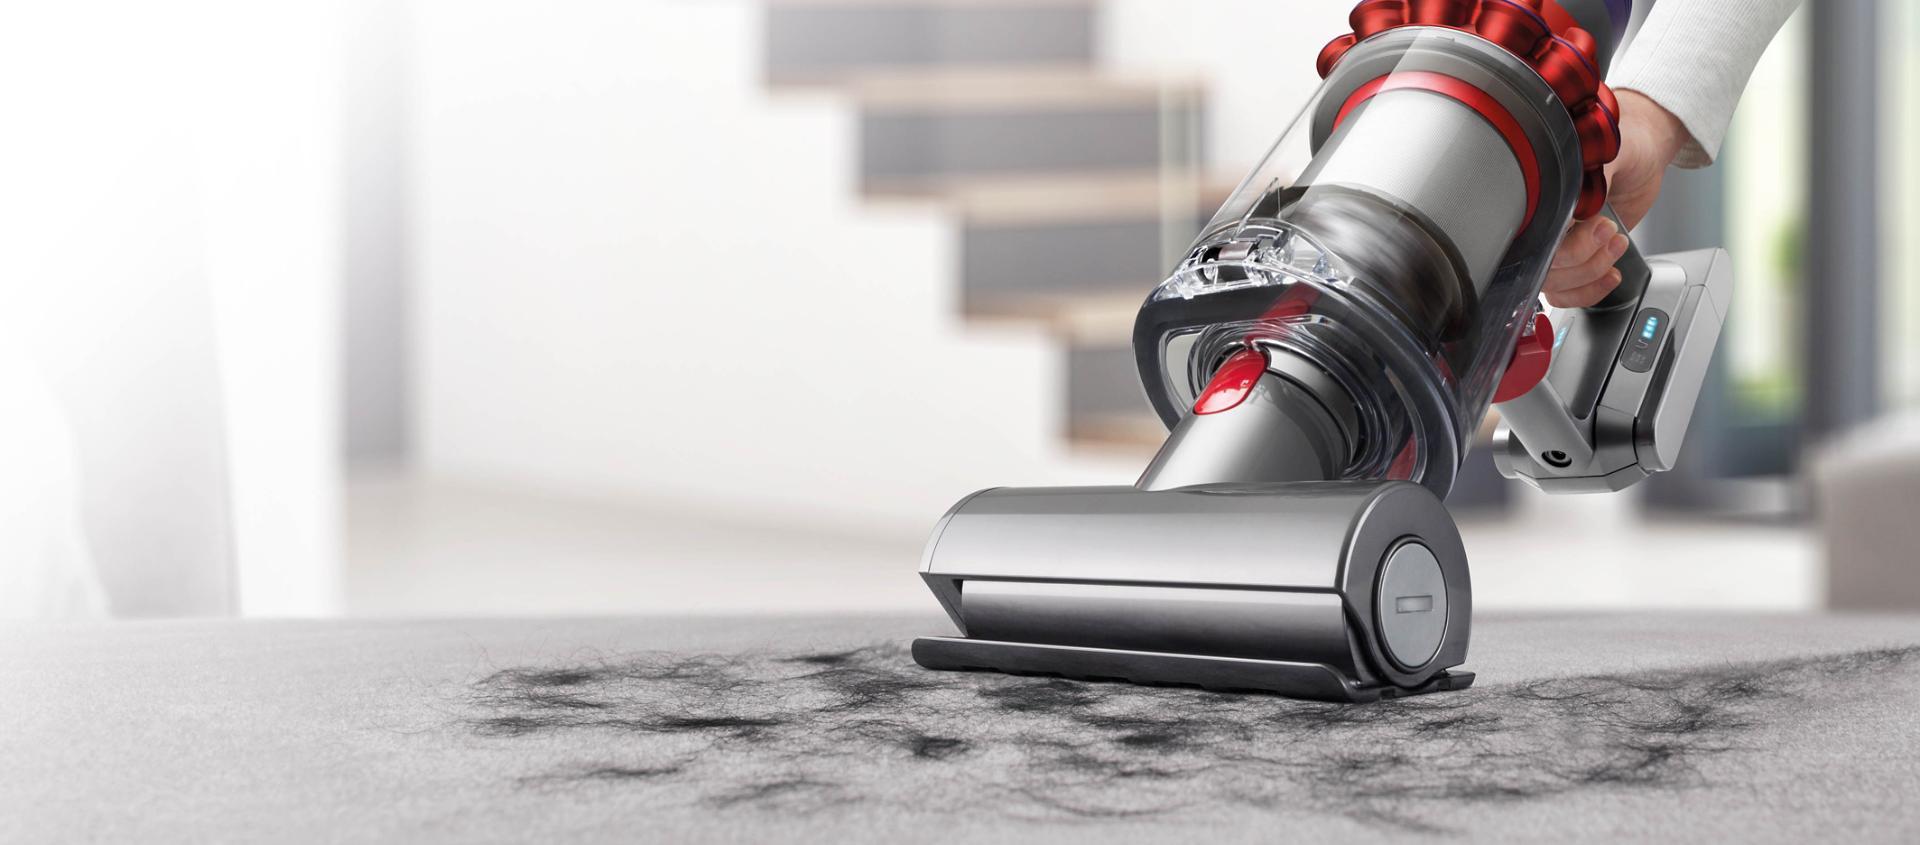 Dyson Cyclone V10™ 吸塵機於手提式下清潔傢具裝飾